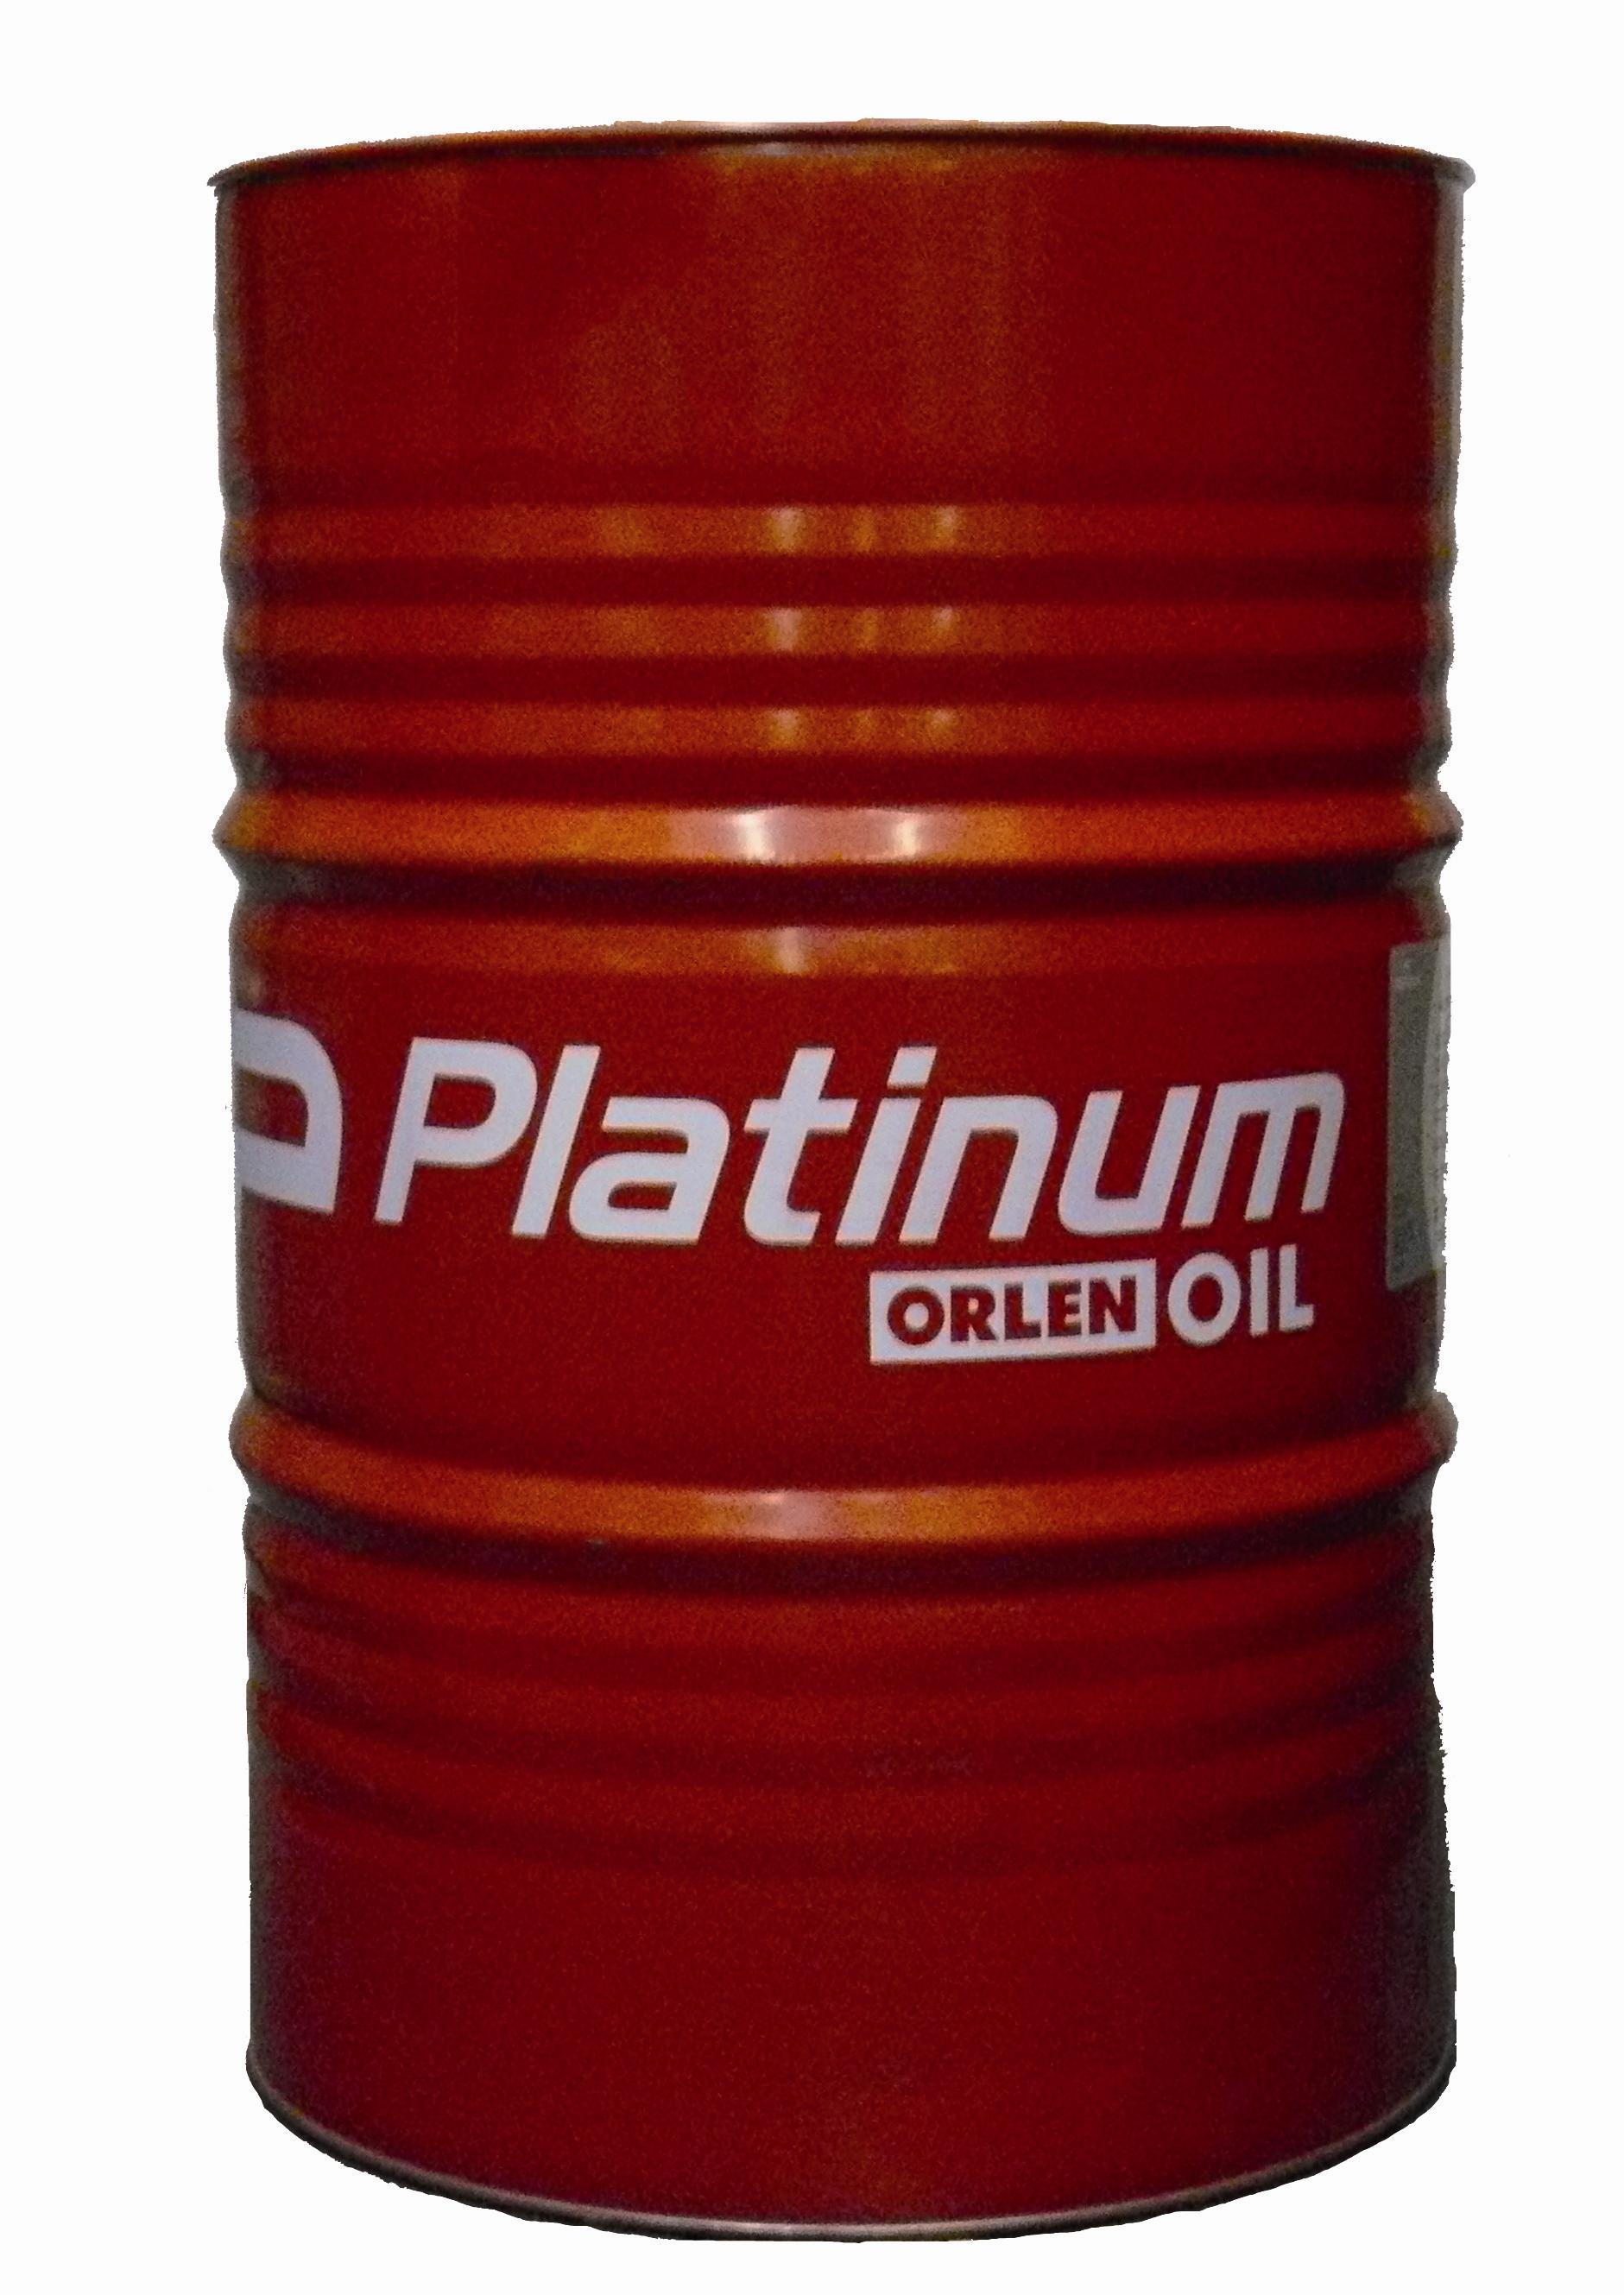 PLATINUM CLASSIC SEMISYNTHETIC 10W/40  KM 60L